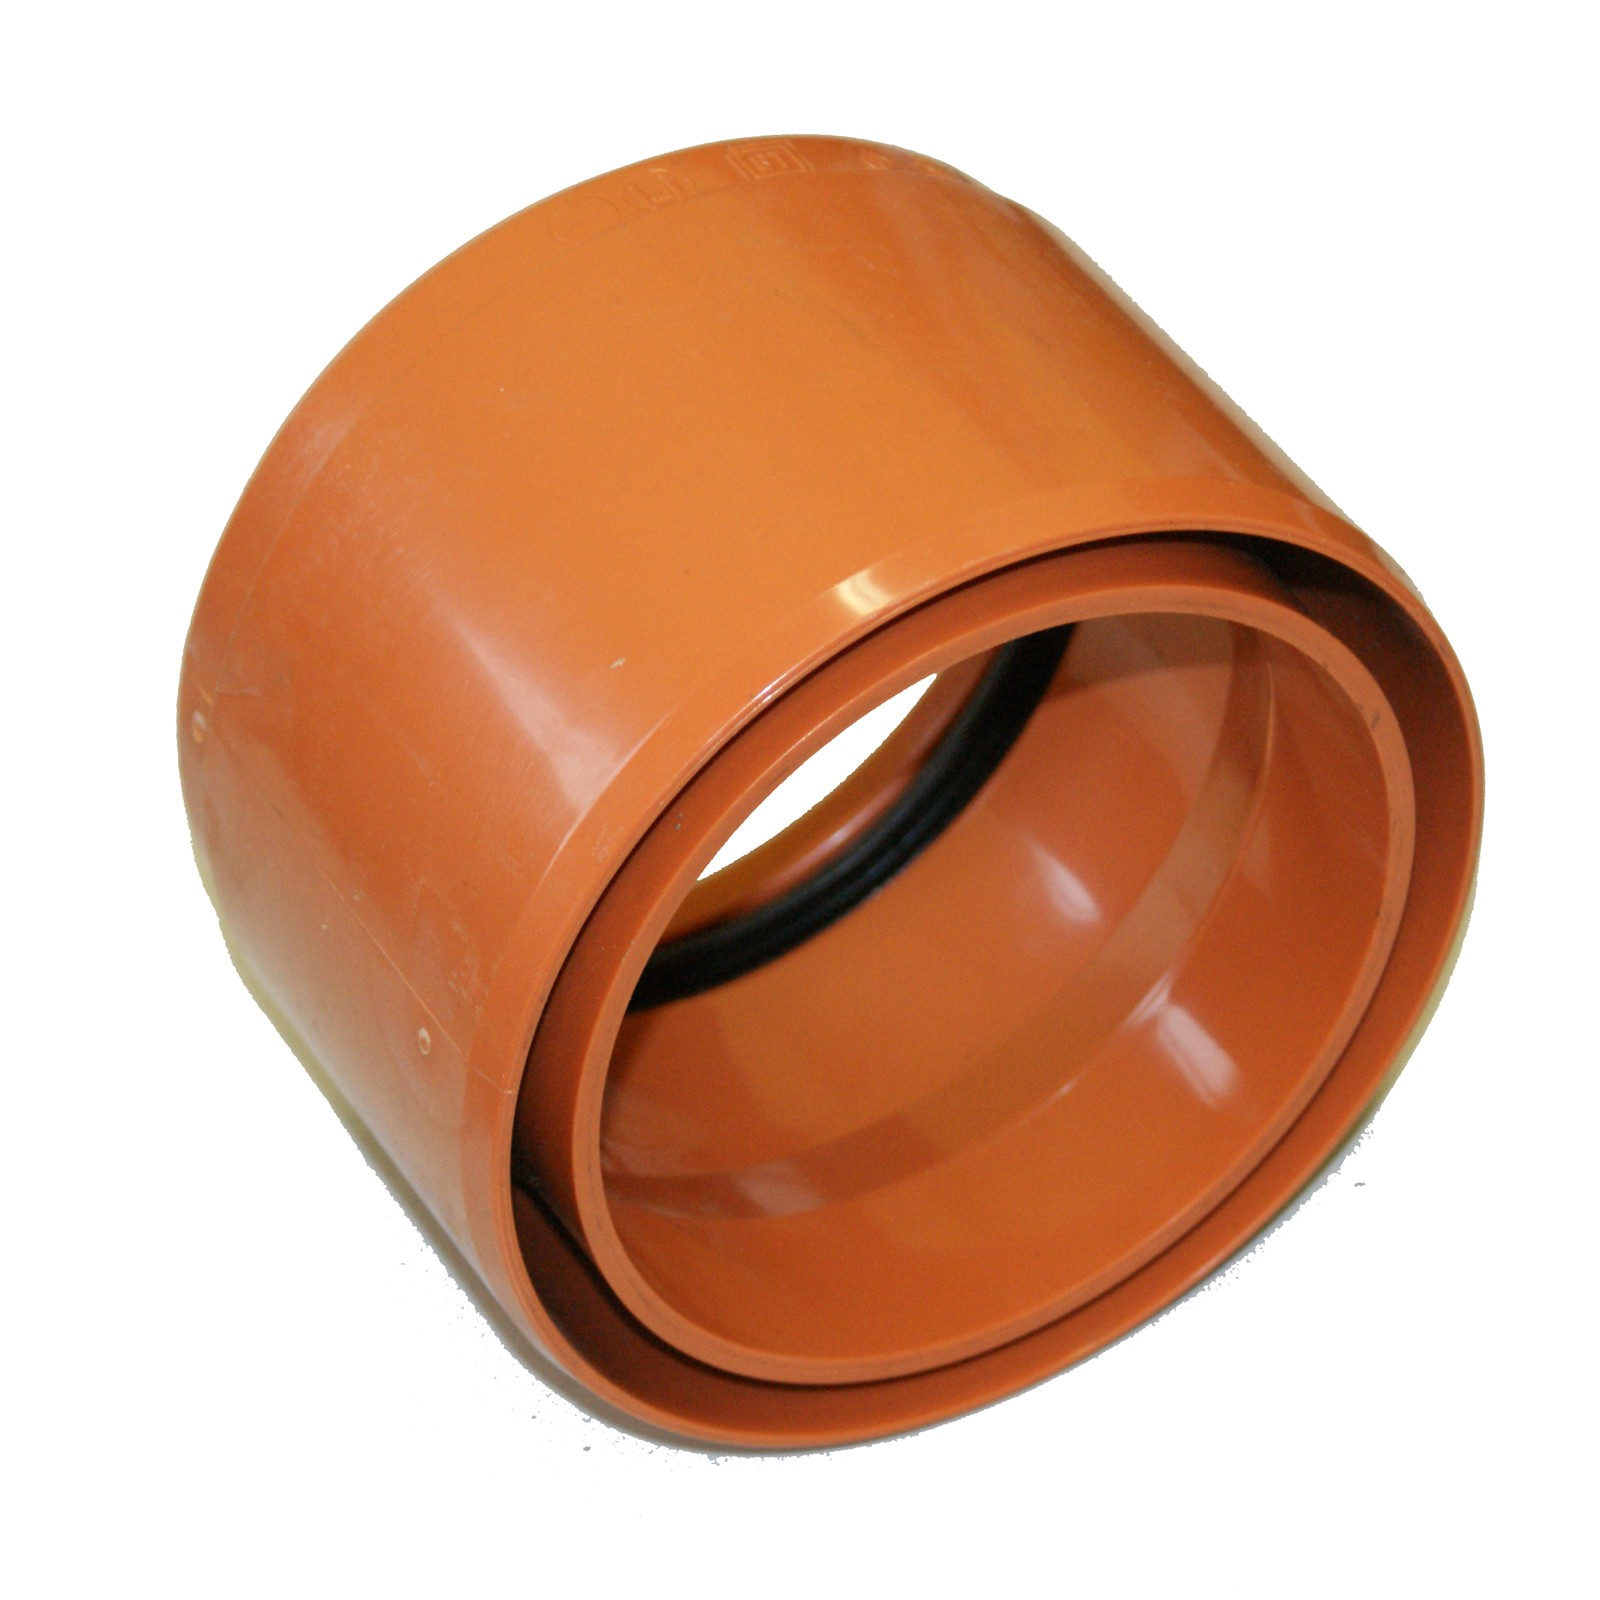 kg anschluss an steinzeugrohr muffe dn 200 kgusm abwasserrohr. Black Bedroom Furniture Sets. Home Design Ideas